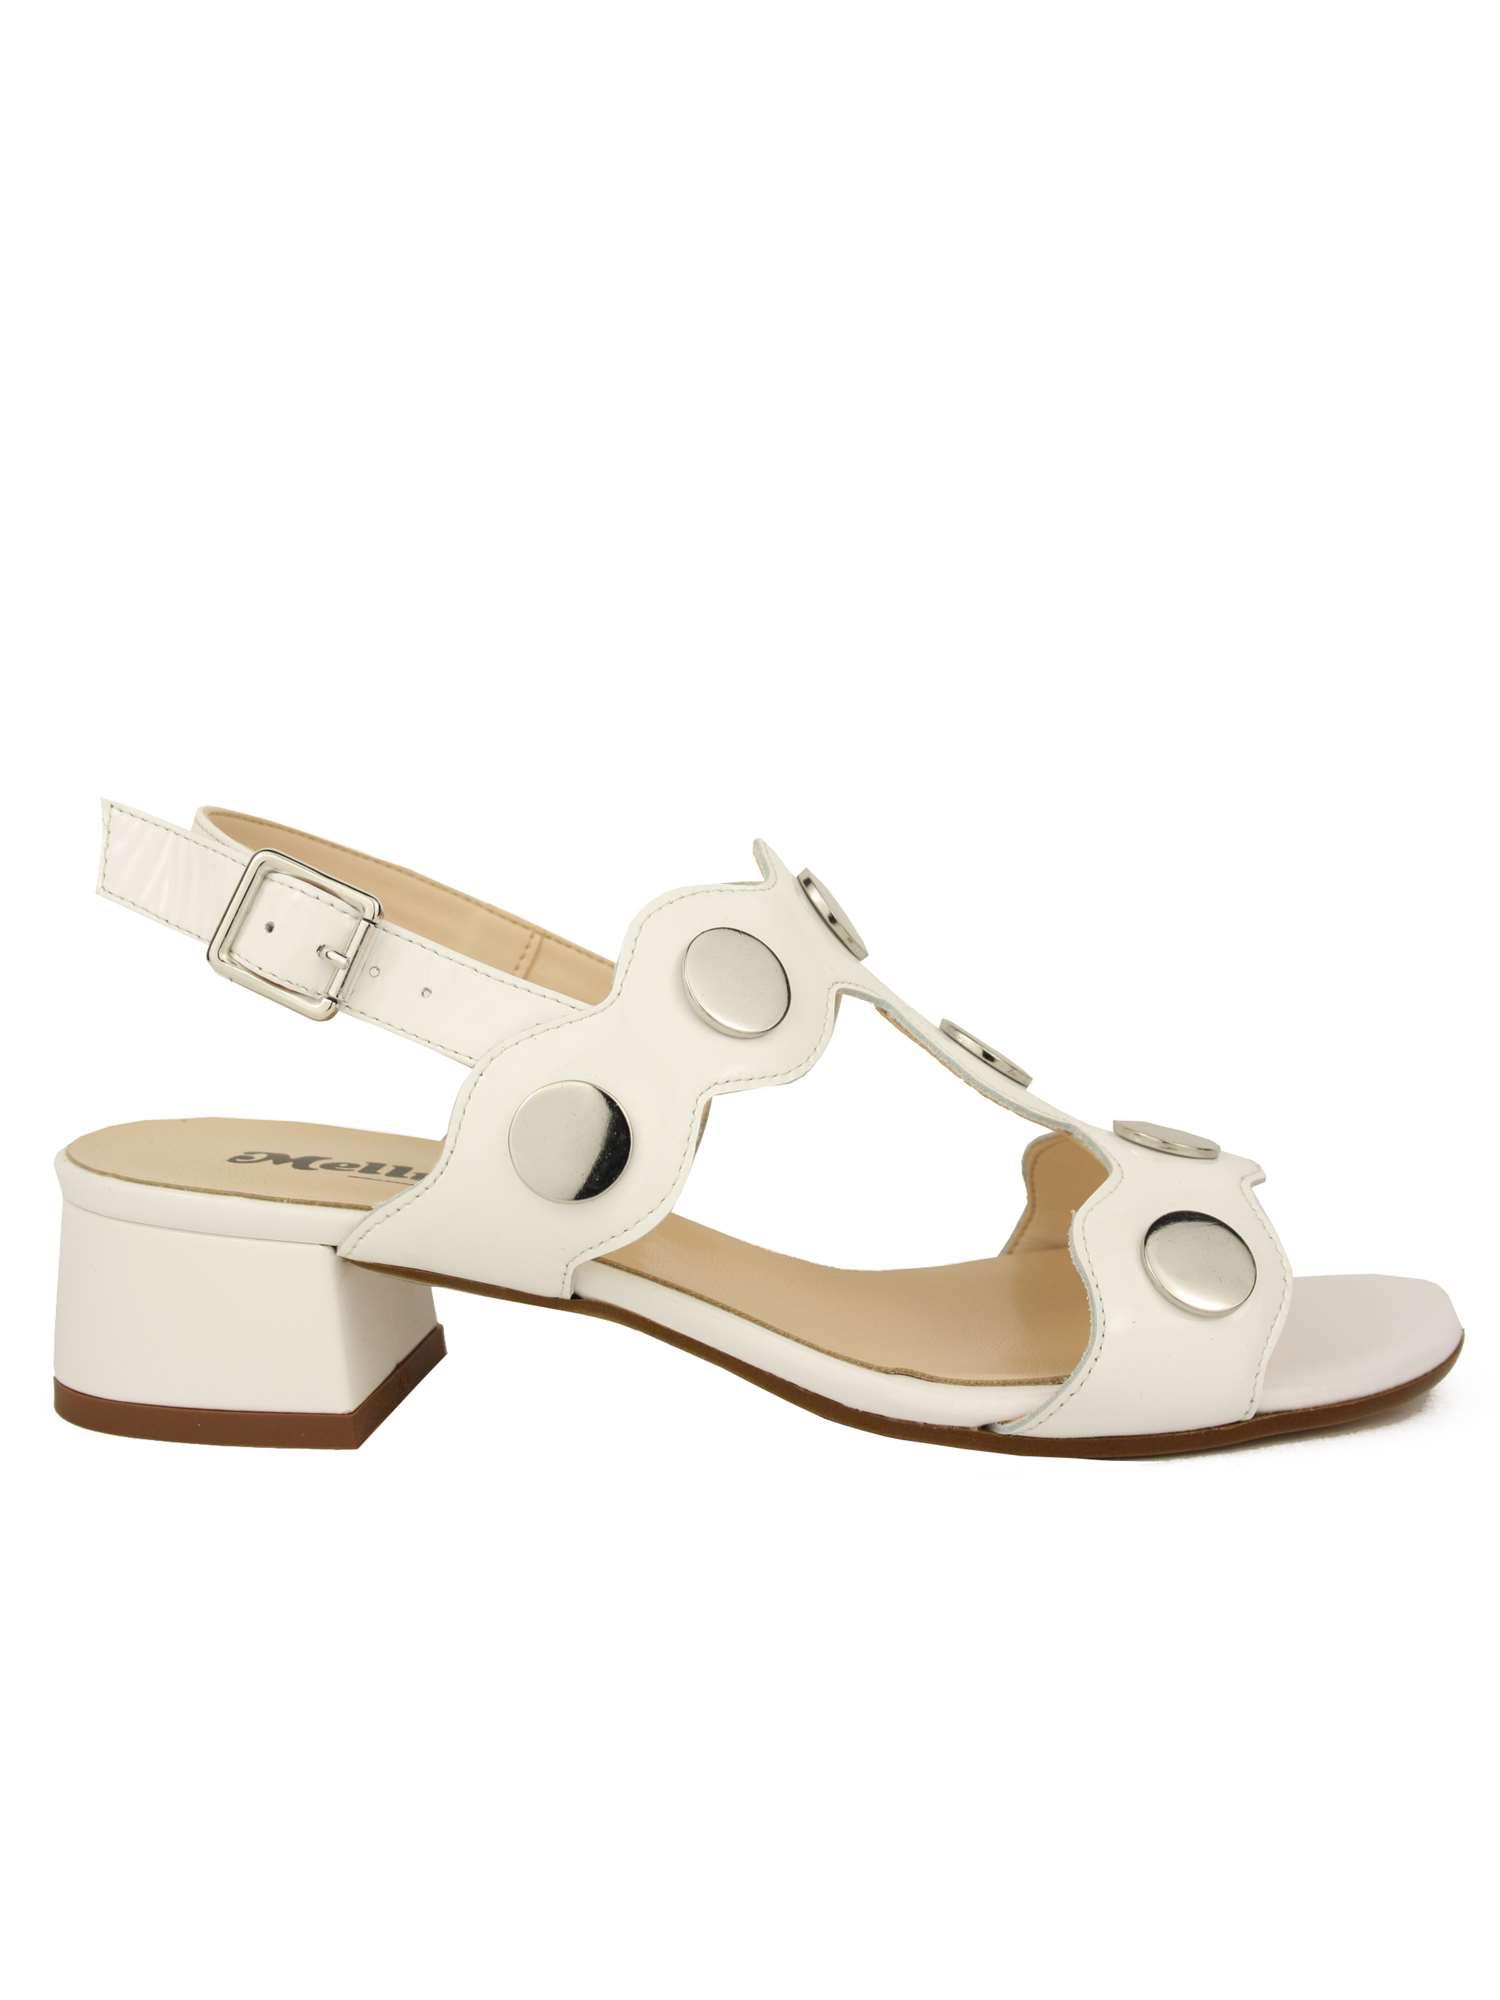 Melluso Sandalo Bianco   Sandalo Donna Vernice   Tania